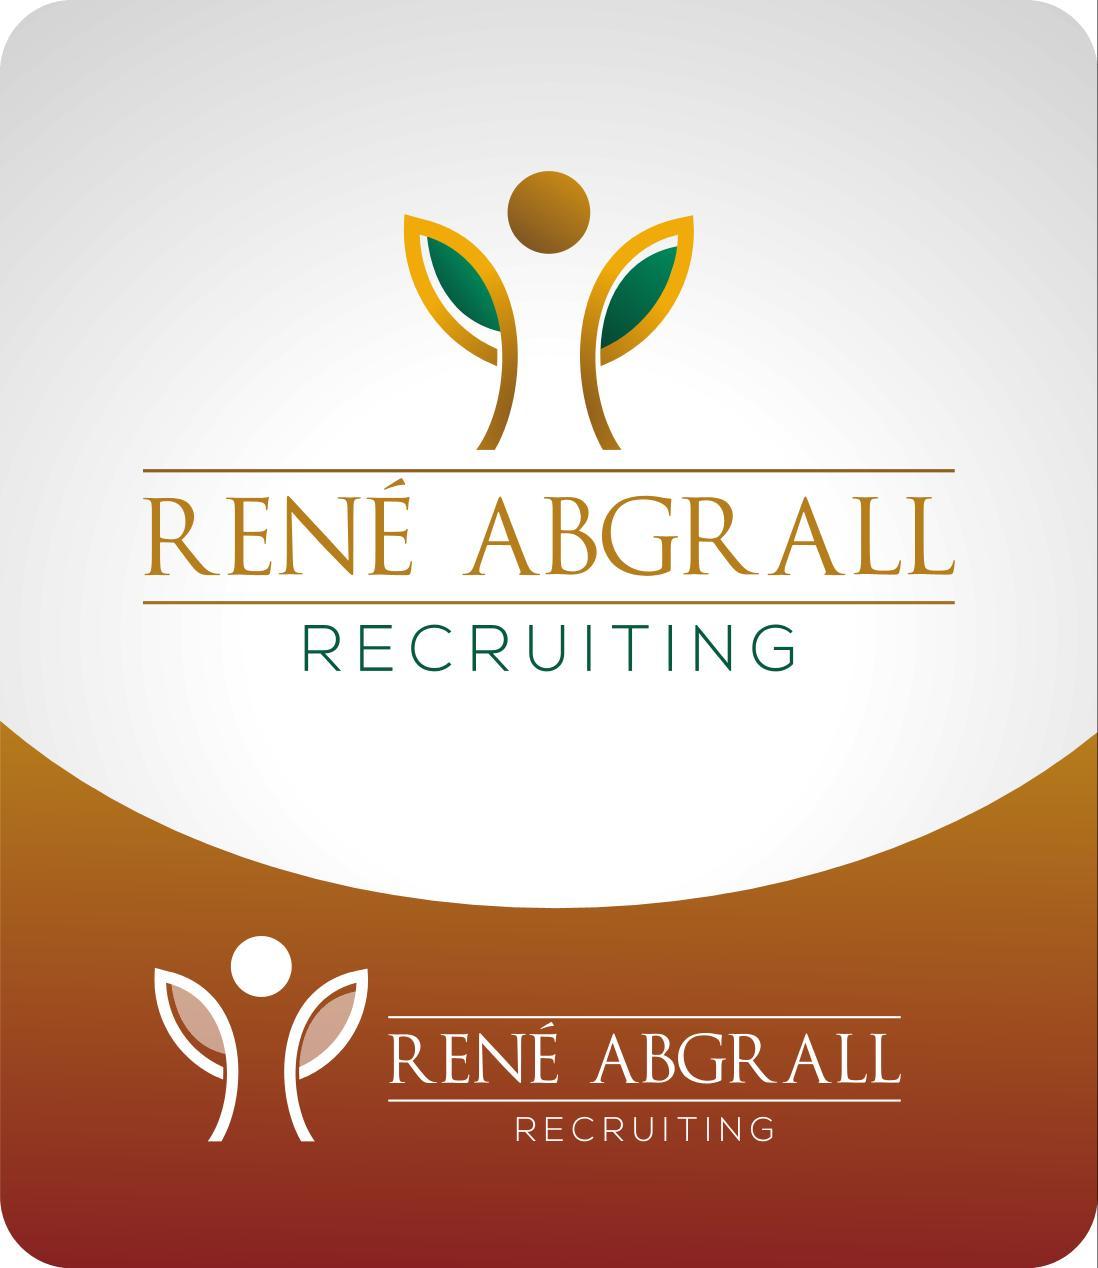 Logo Design by luvrenz - Entry No. 30 in the Logo Design Contest Artistic Logo Design for René Abgrall Recruiting.